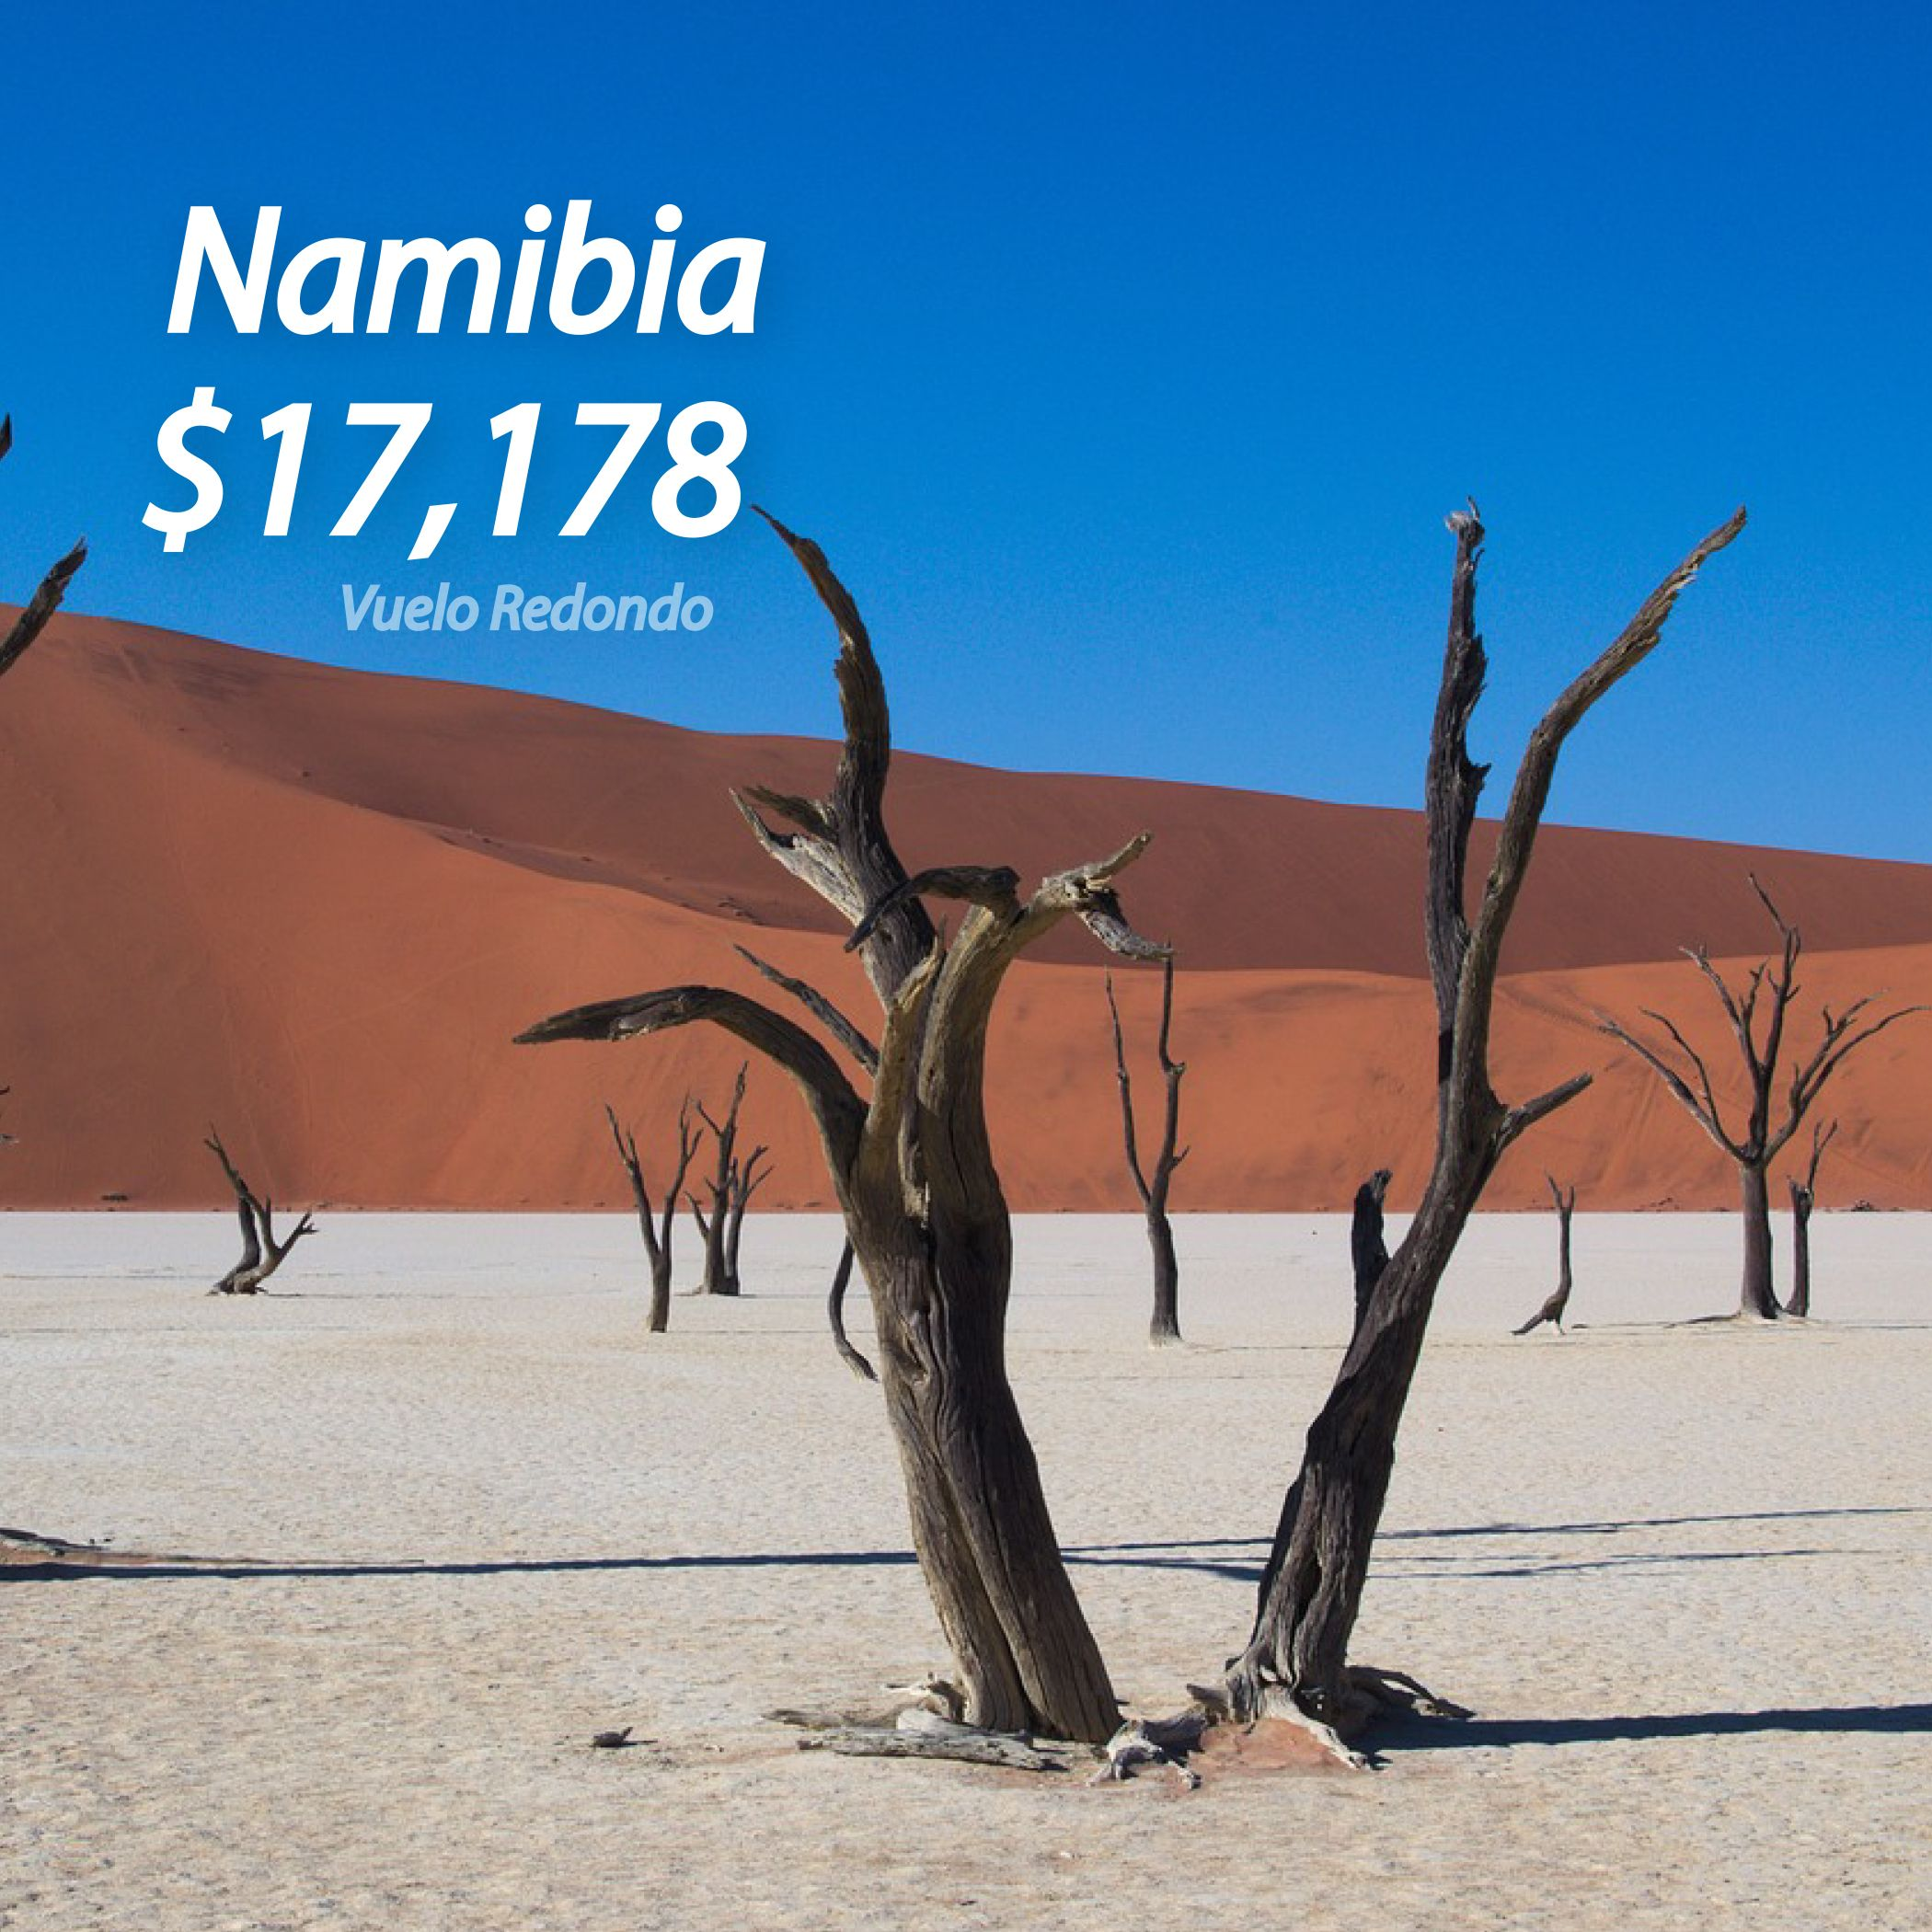 namibi-compressor